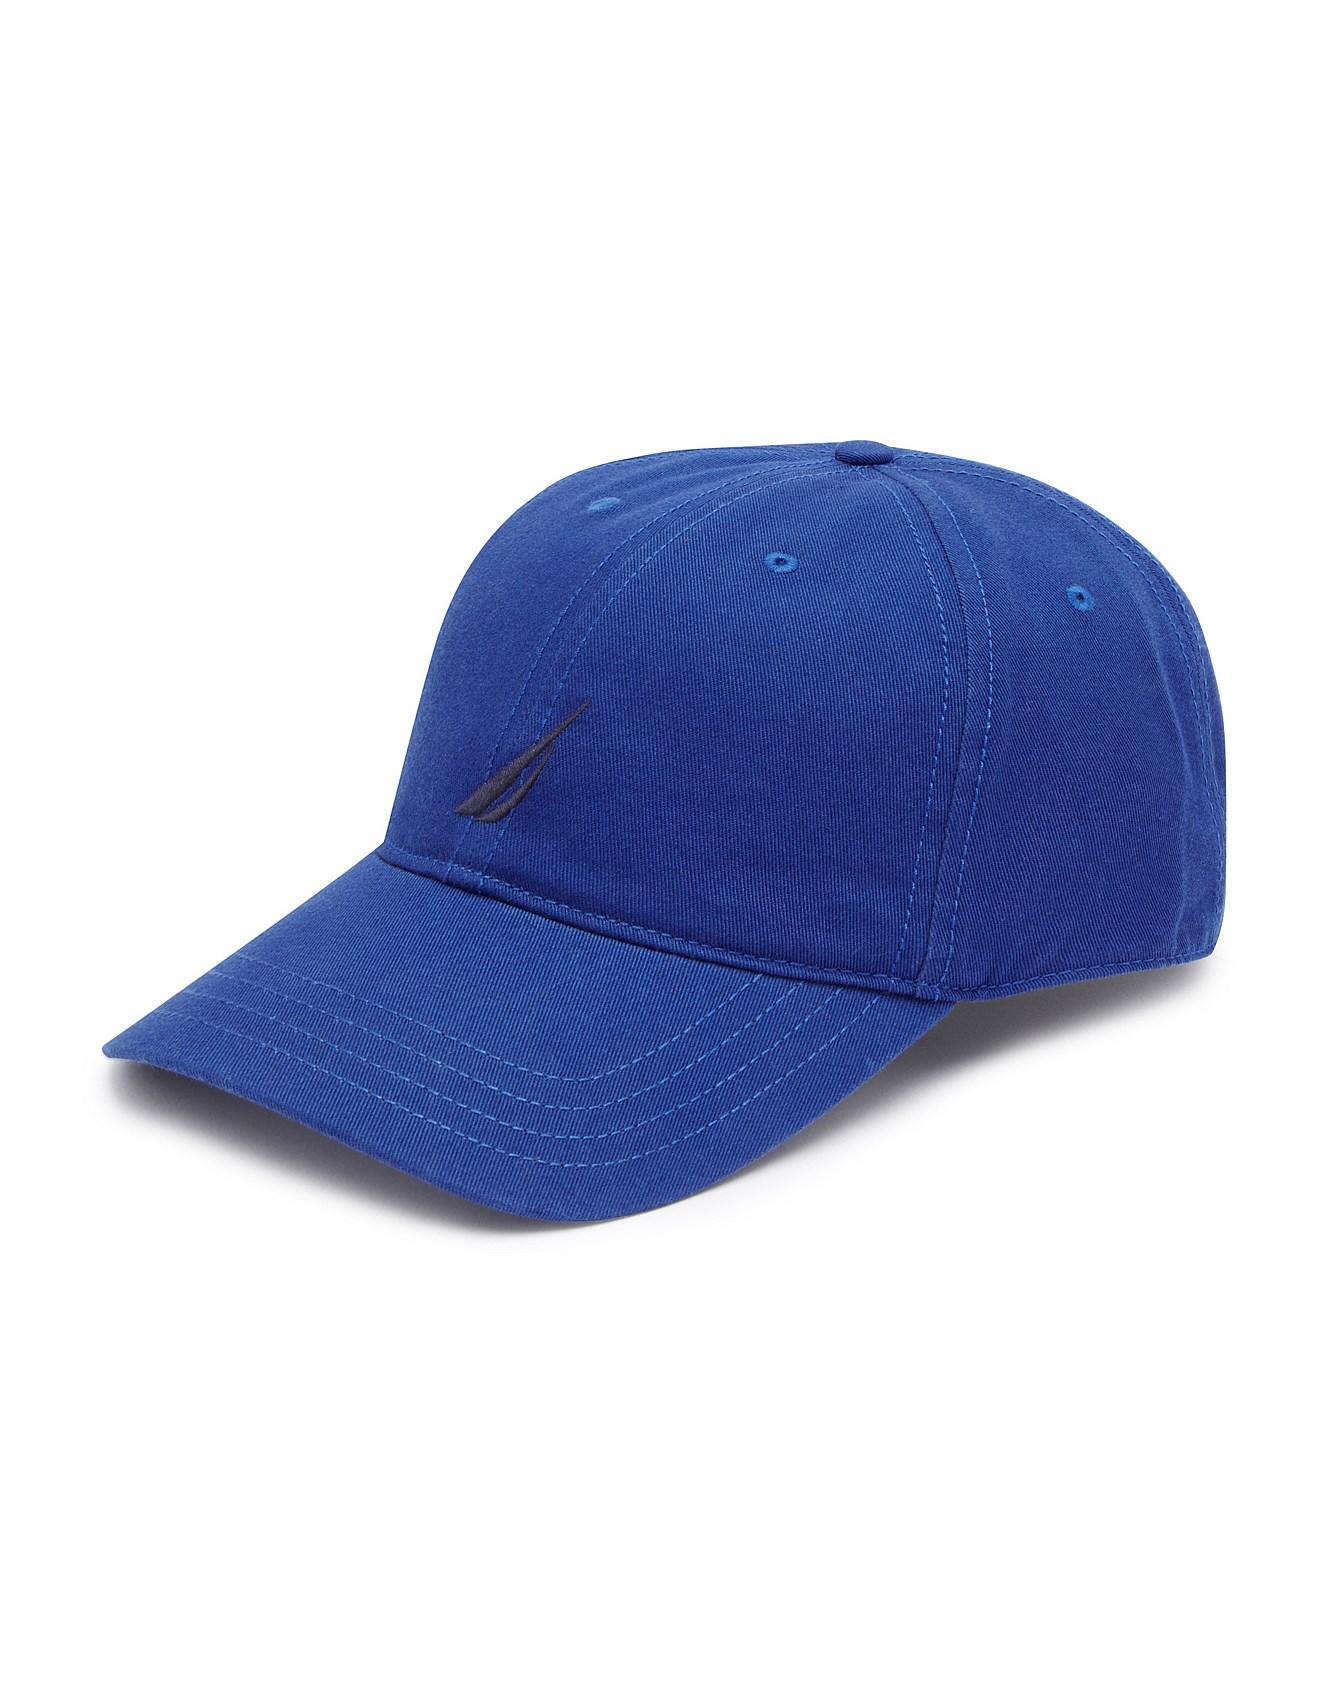 246c485f2fd 6 PANEL BUCKLE HAT